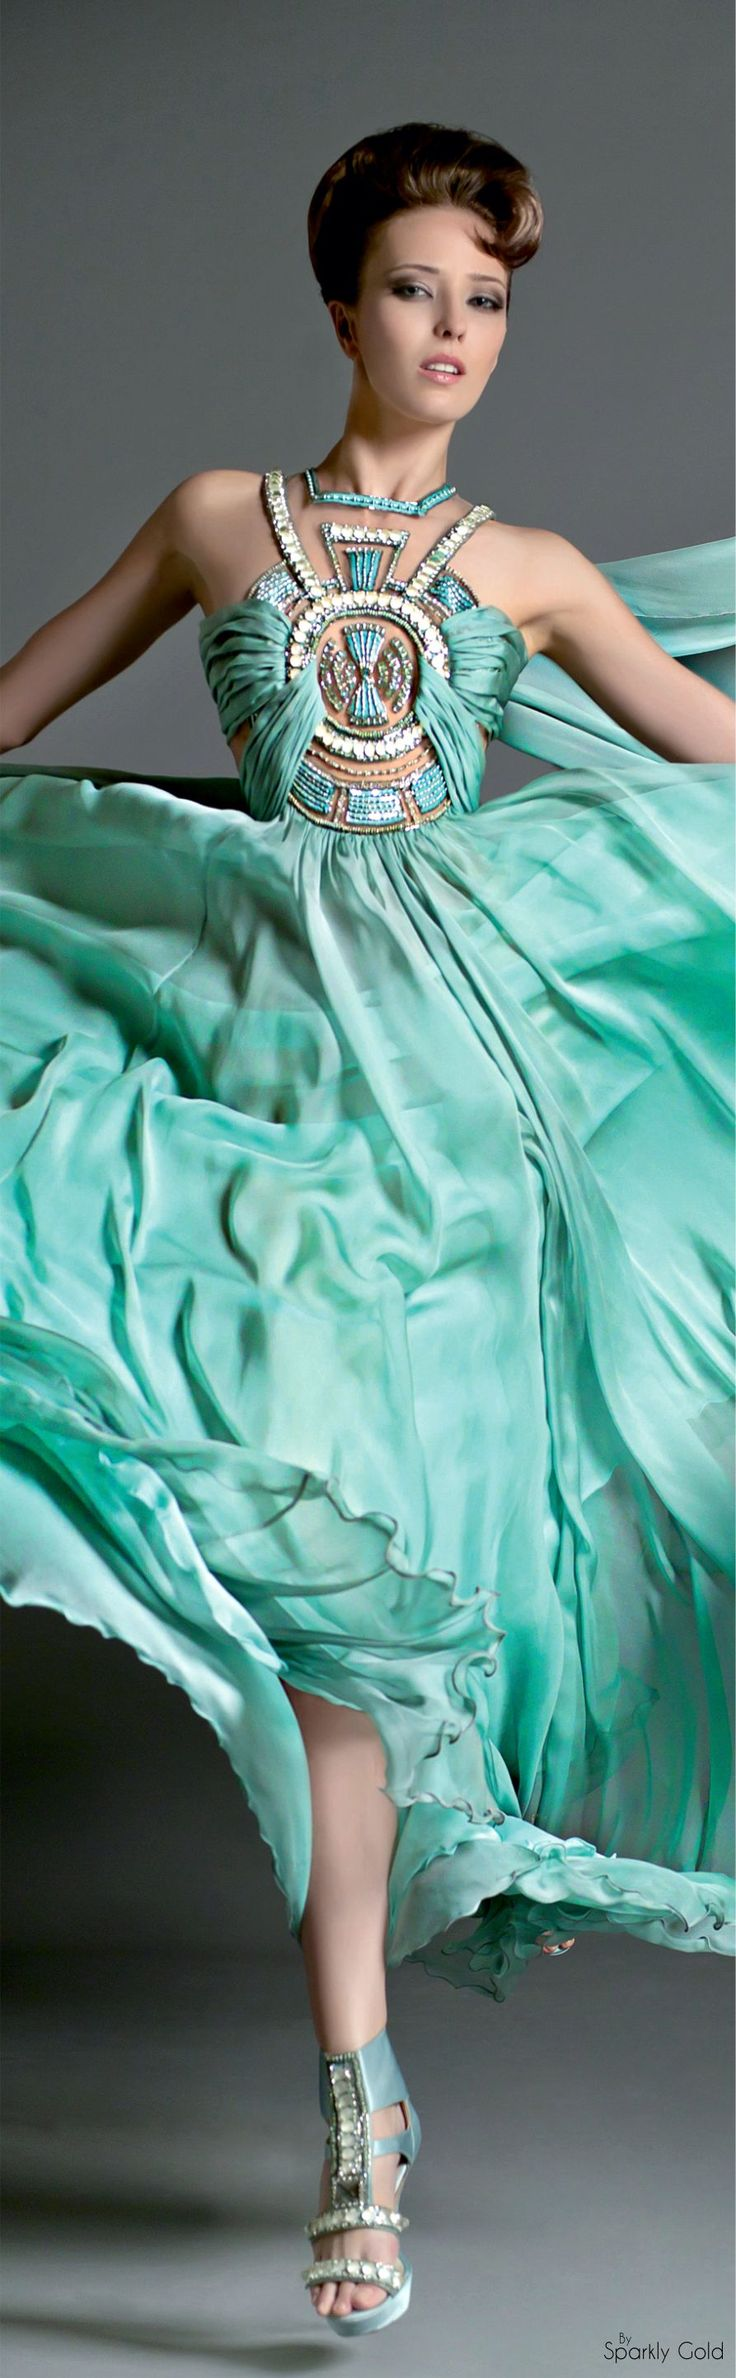 Blanka Matragi 30th Anniversary women fashion outfit clothing stylish apparel @roressclothes closet ideas